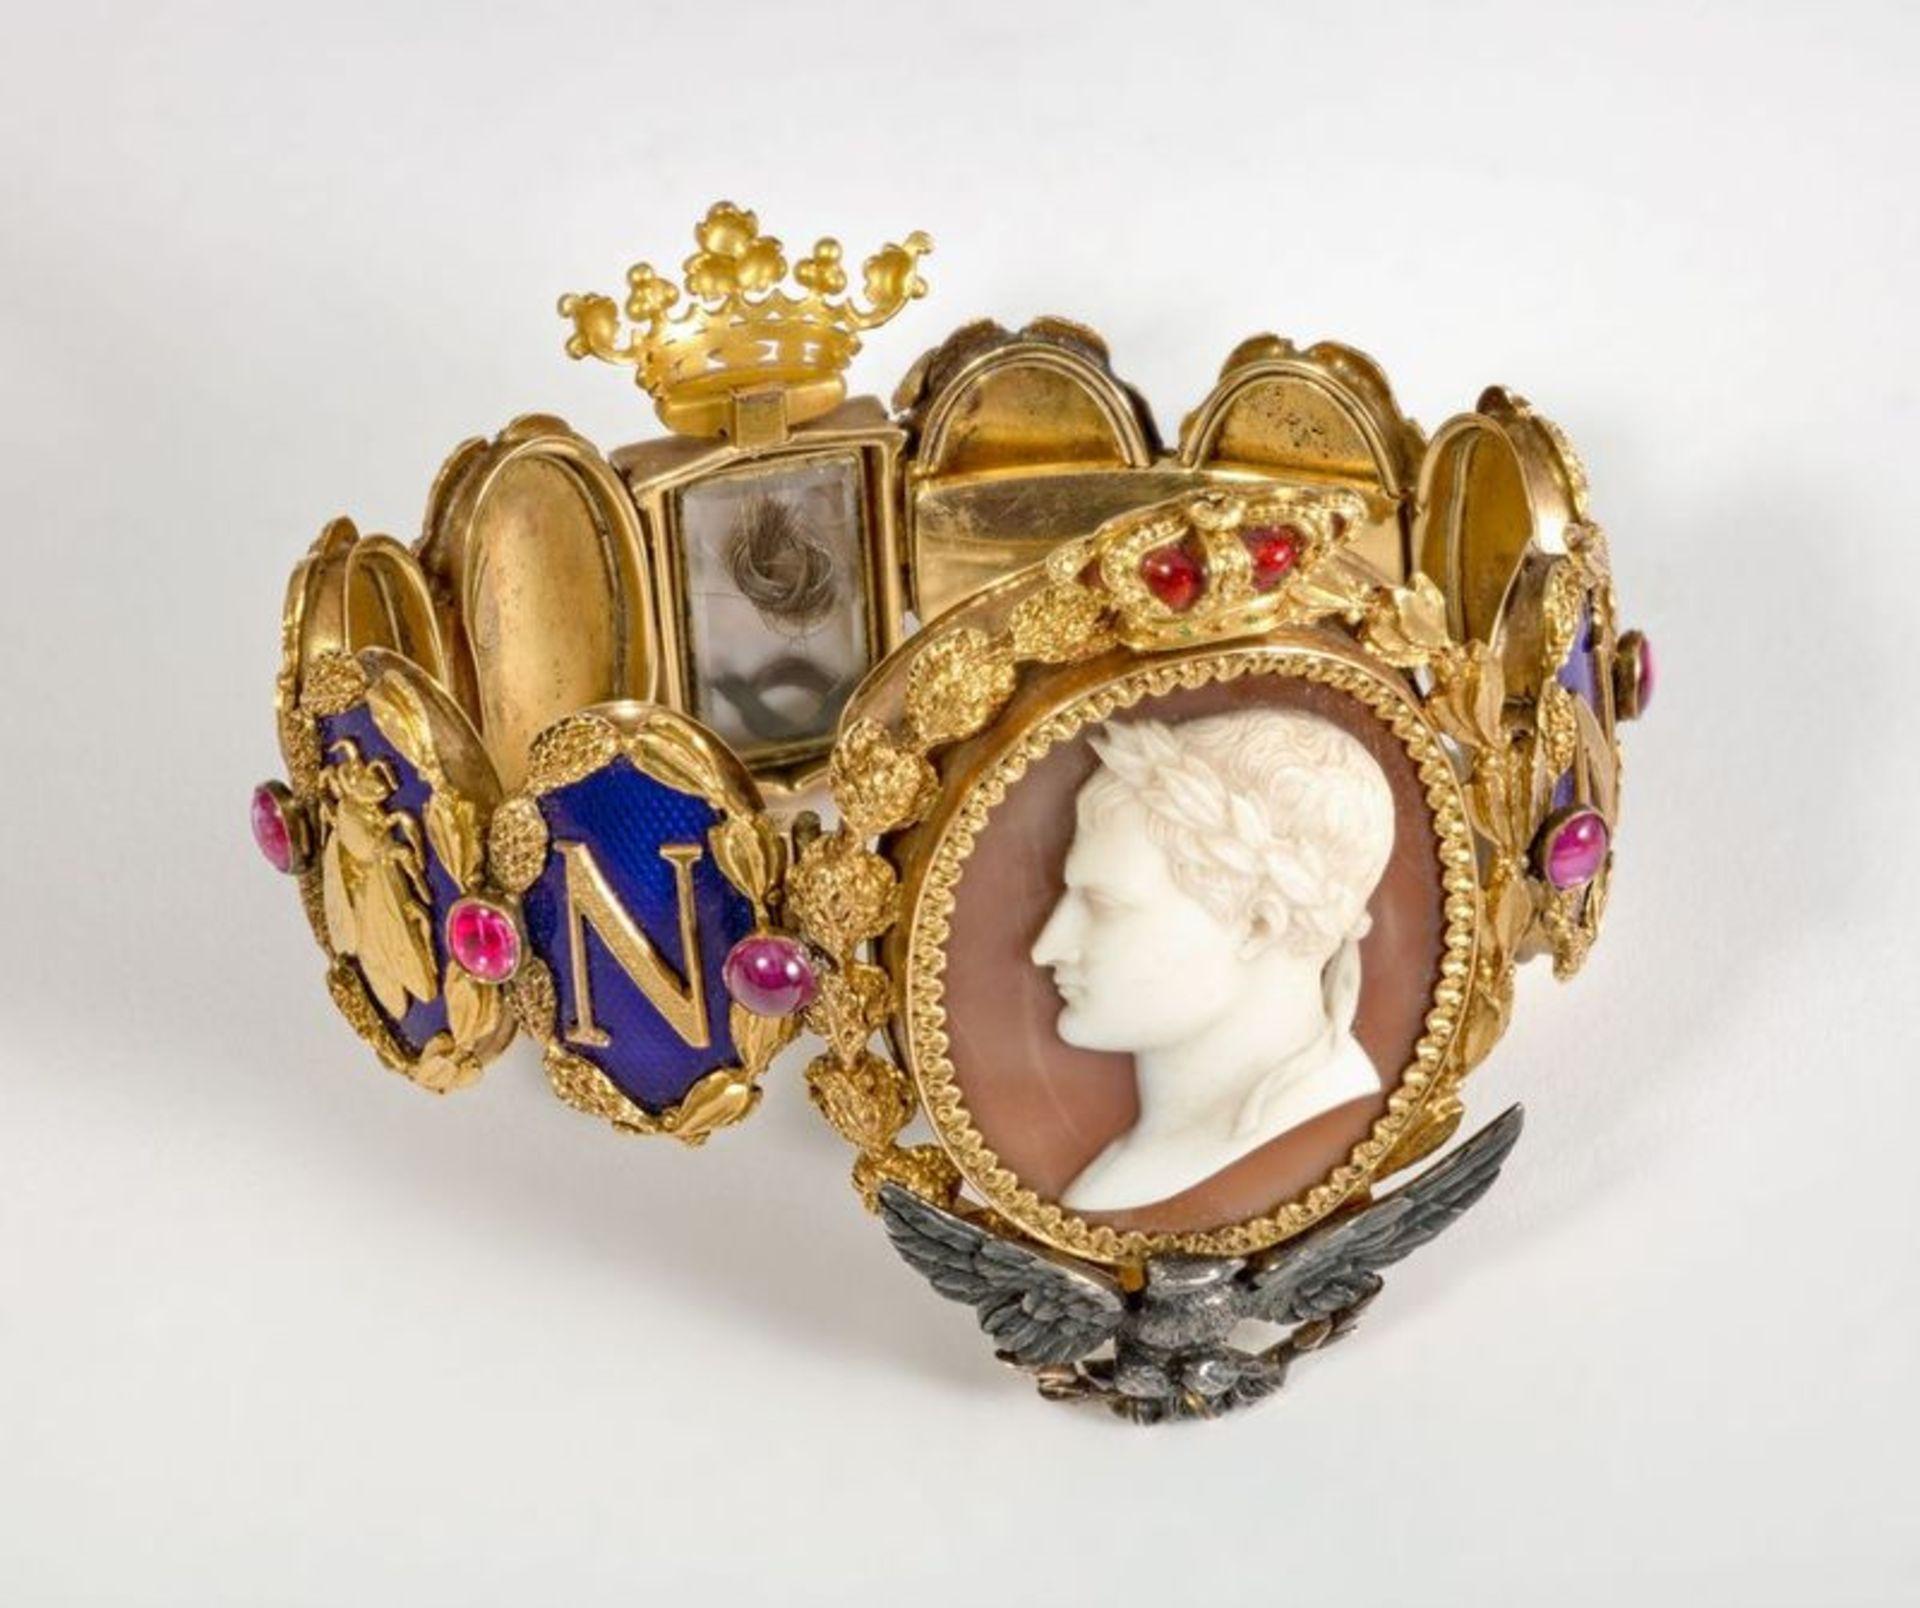 NAPOLEON PRESENTATION BRACELET TO LAS CASES UNIQUE GOLD, BLUE ENAMEL AND GEMSTONE [...] - Bild 3 aus 3